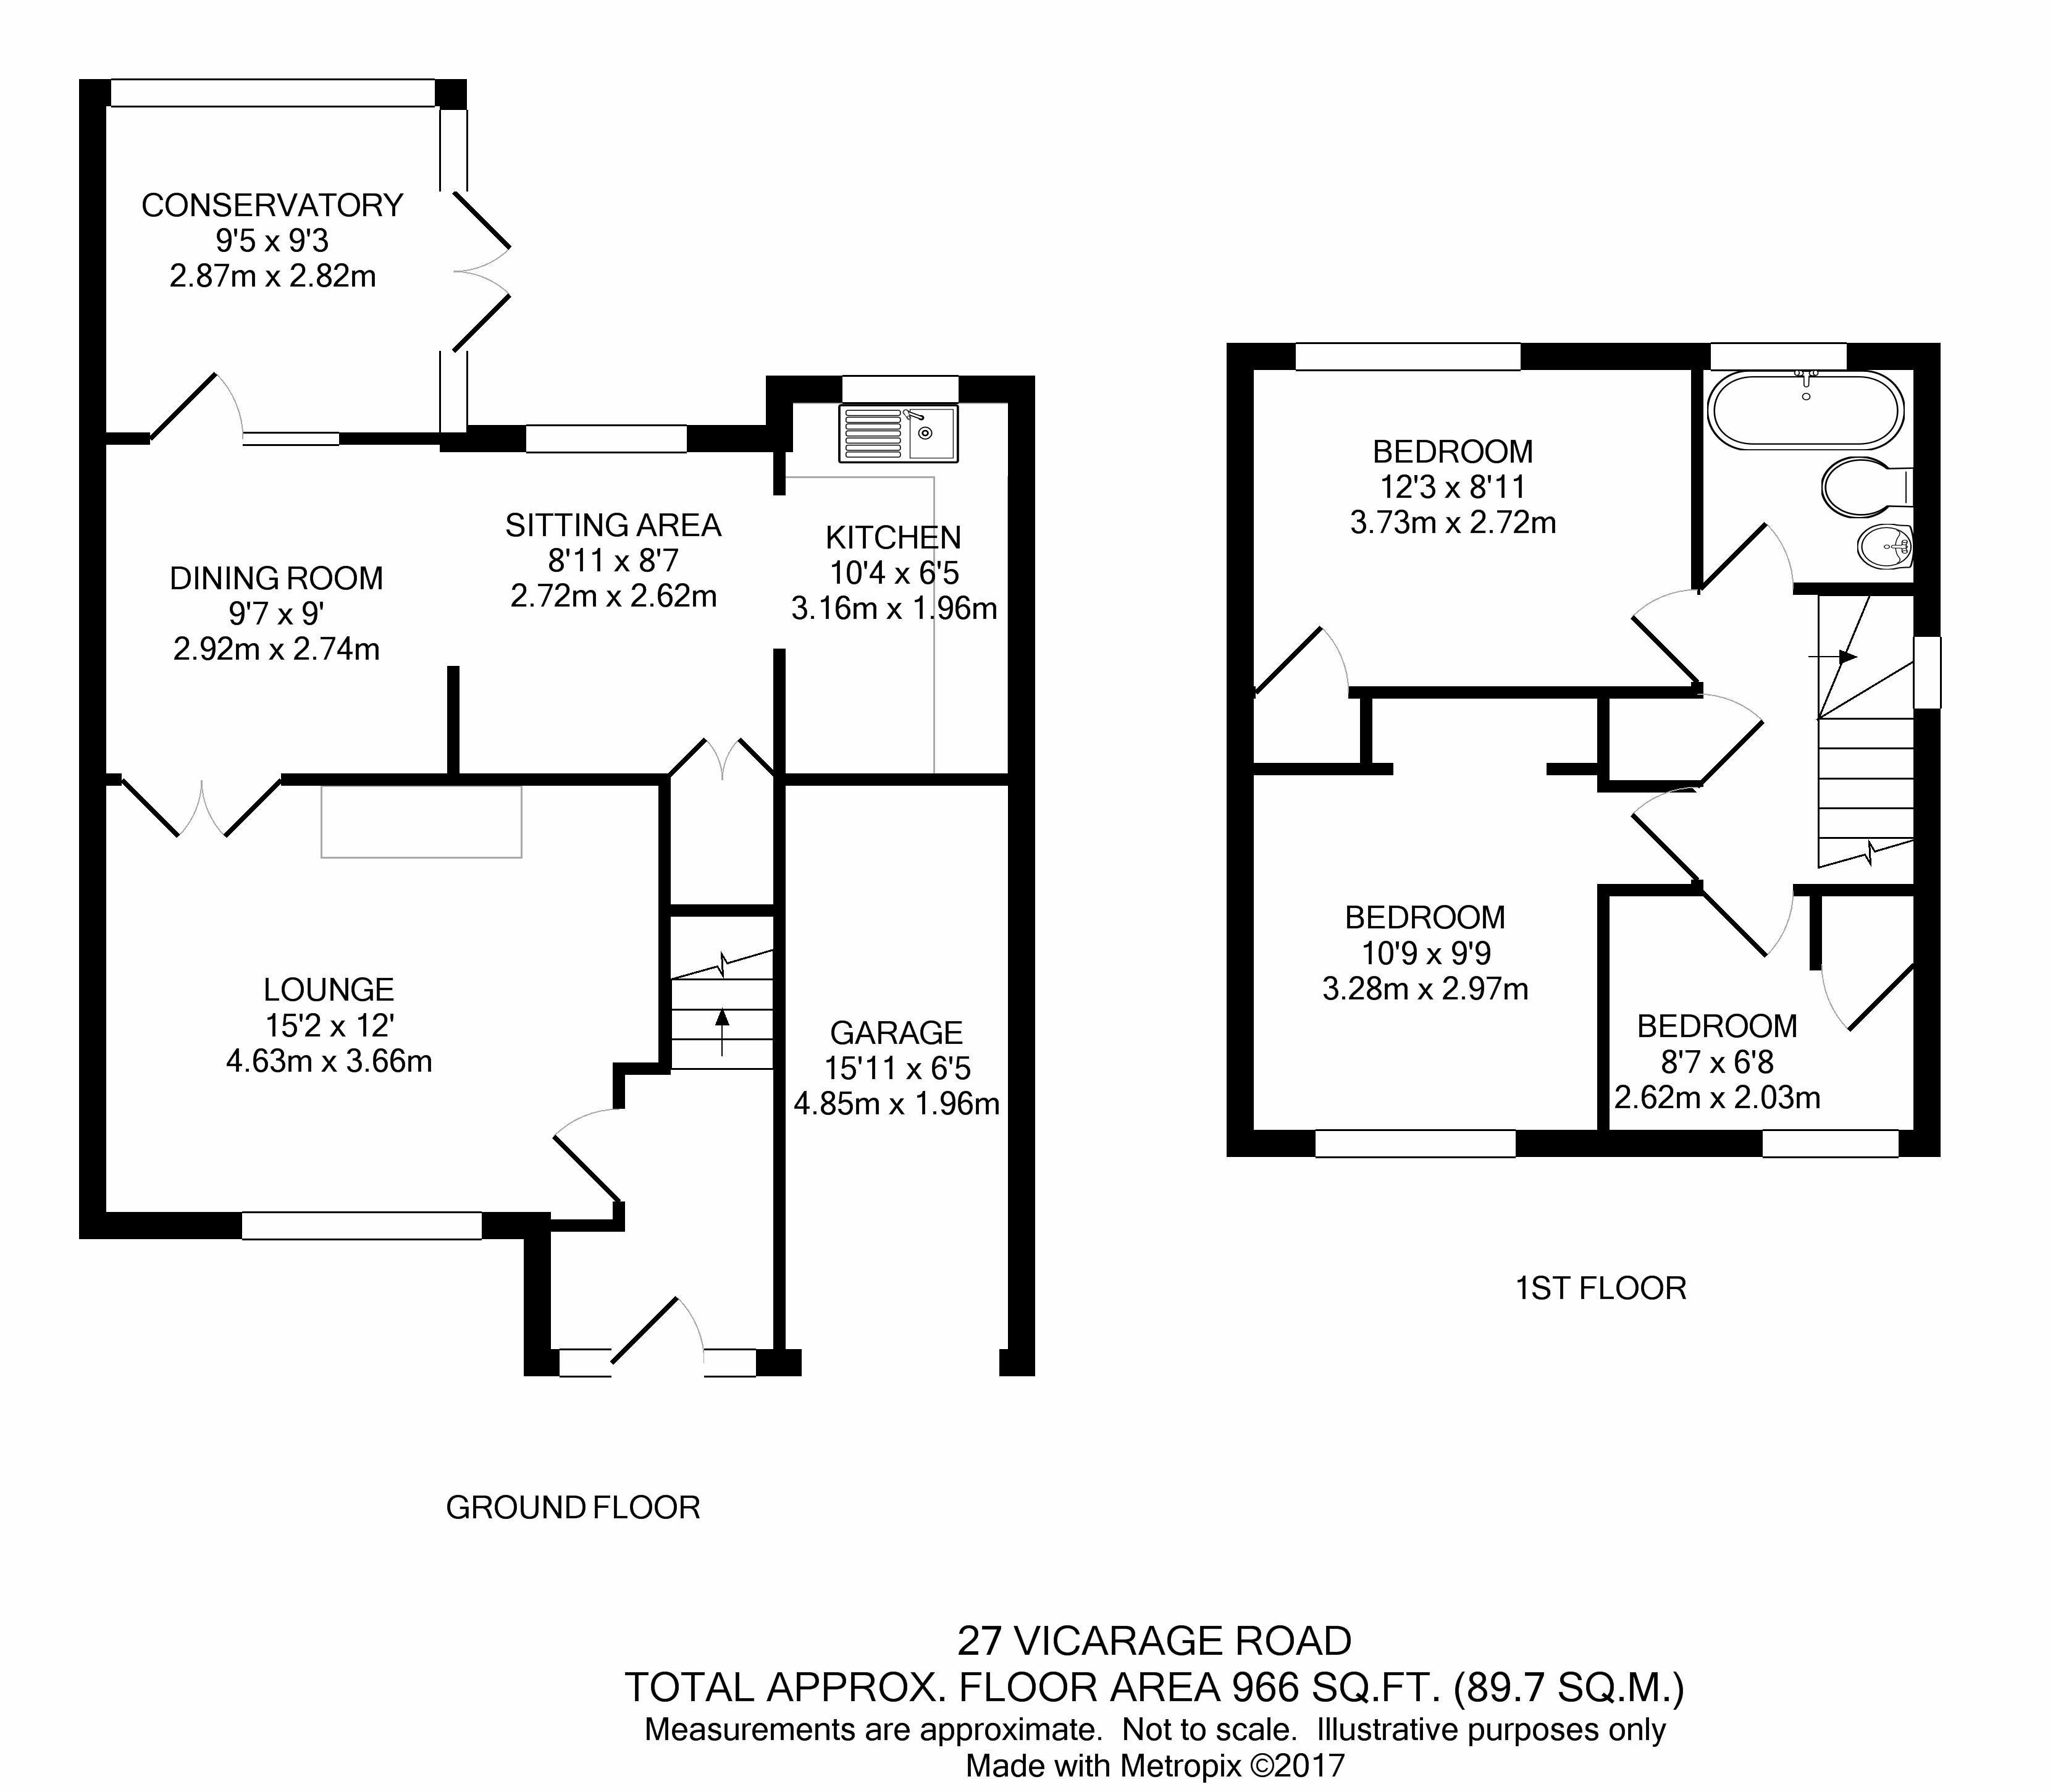 Vicarage Road Penn Wolverhampton Wv4 3 Bedroom Semi